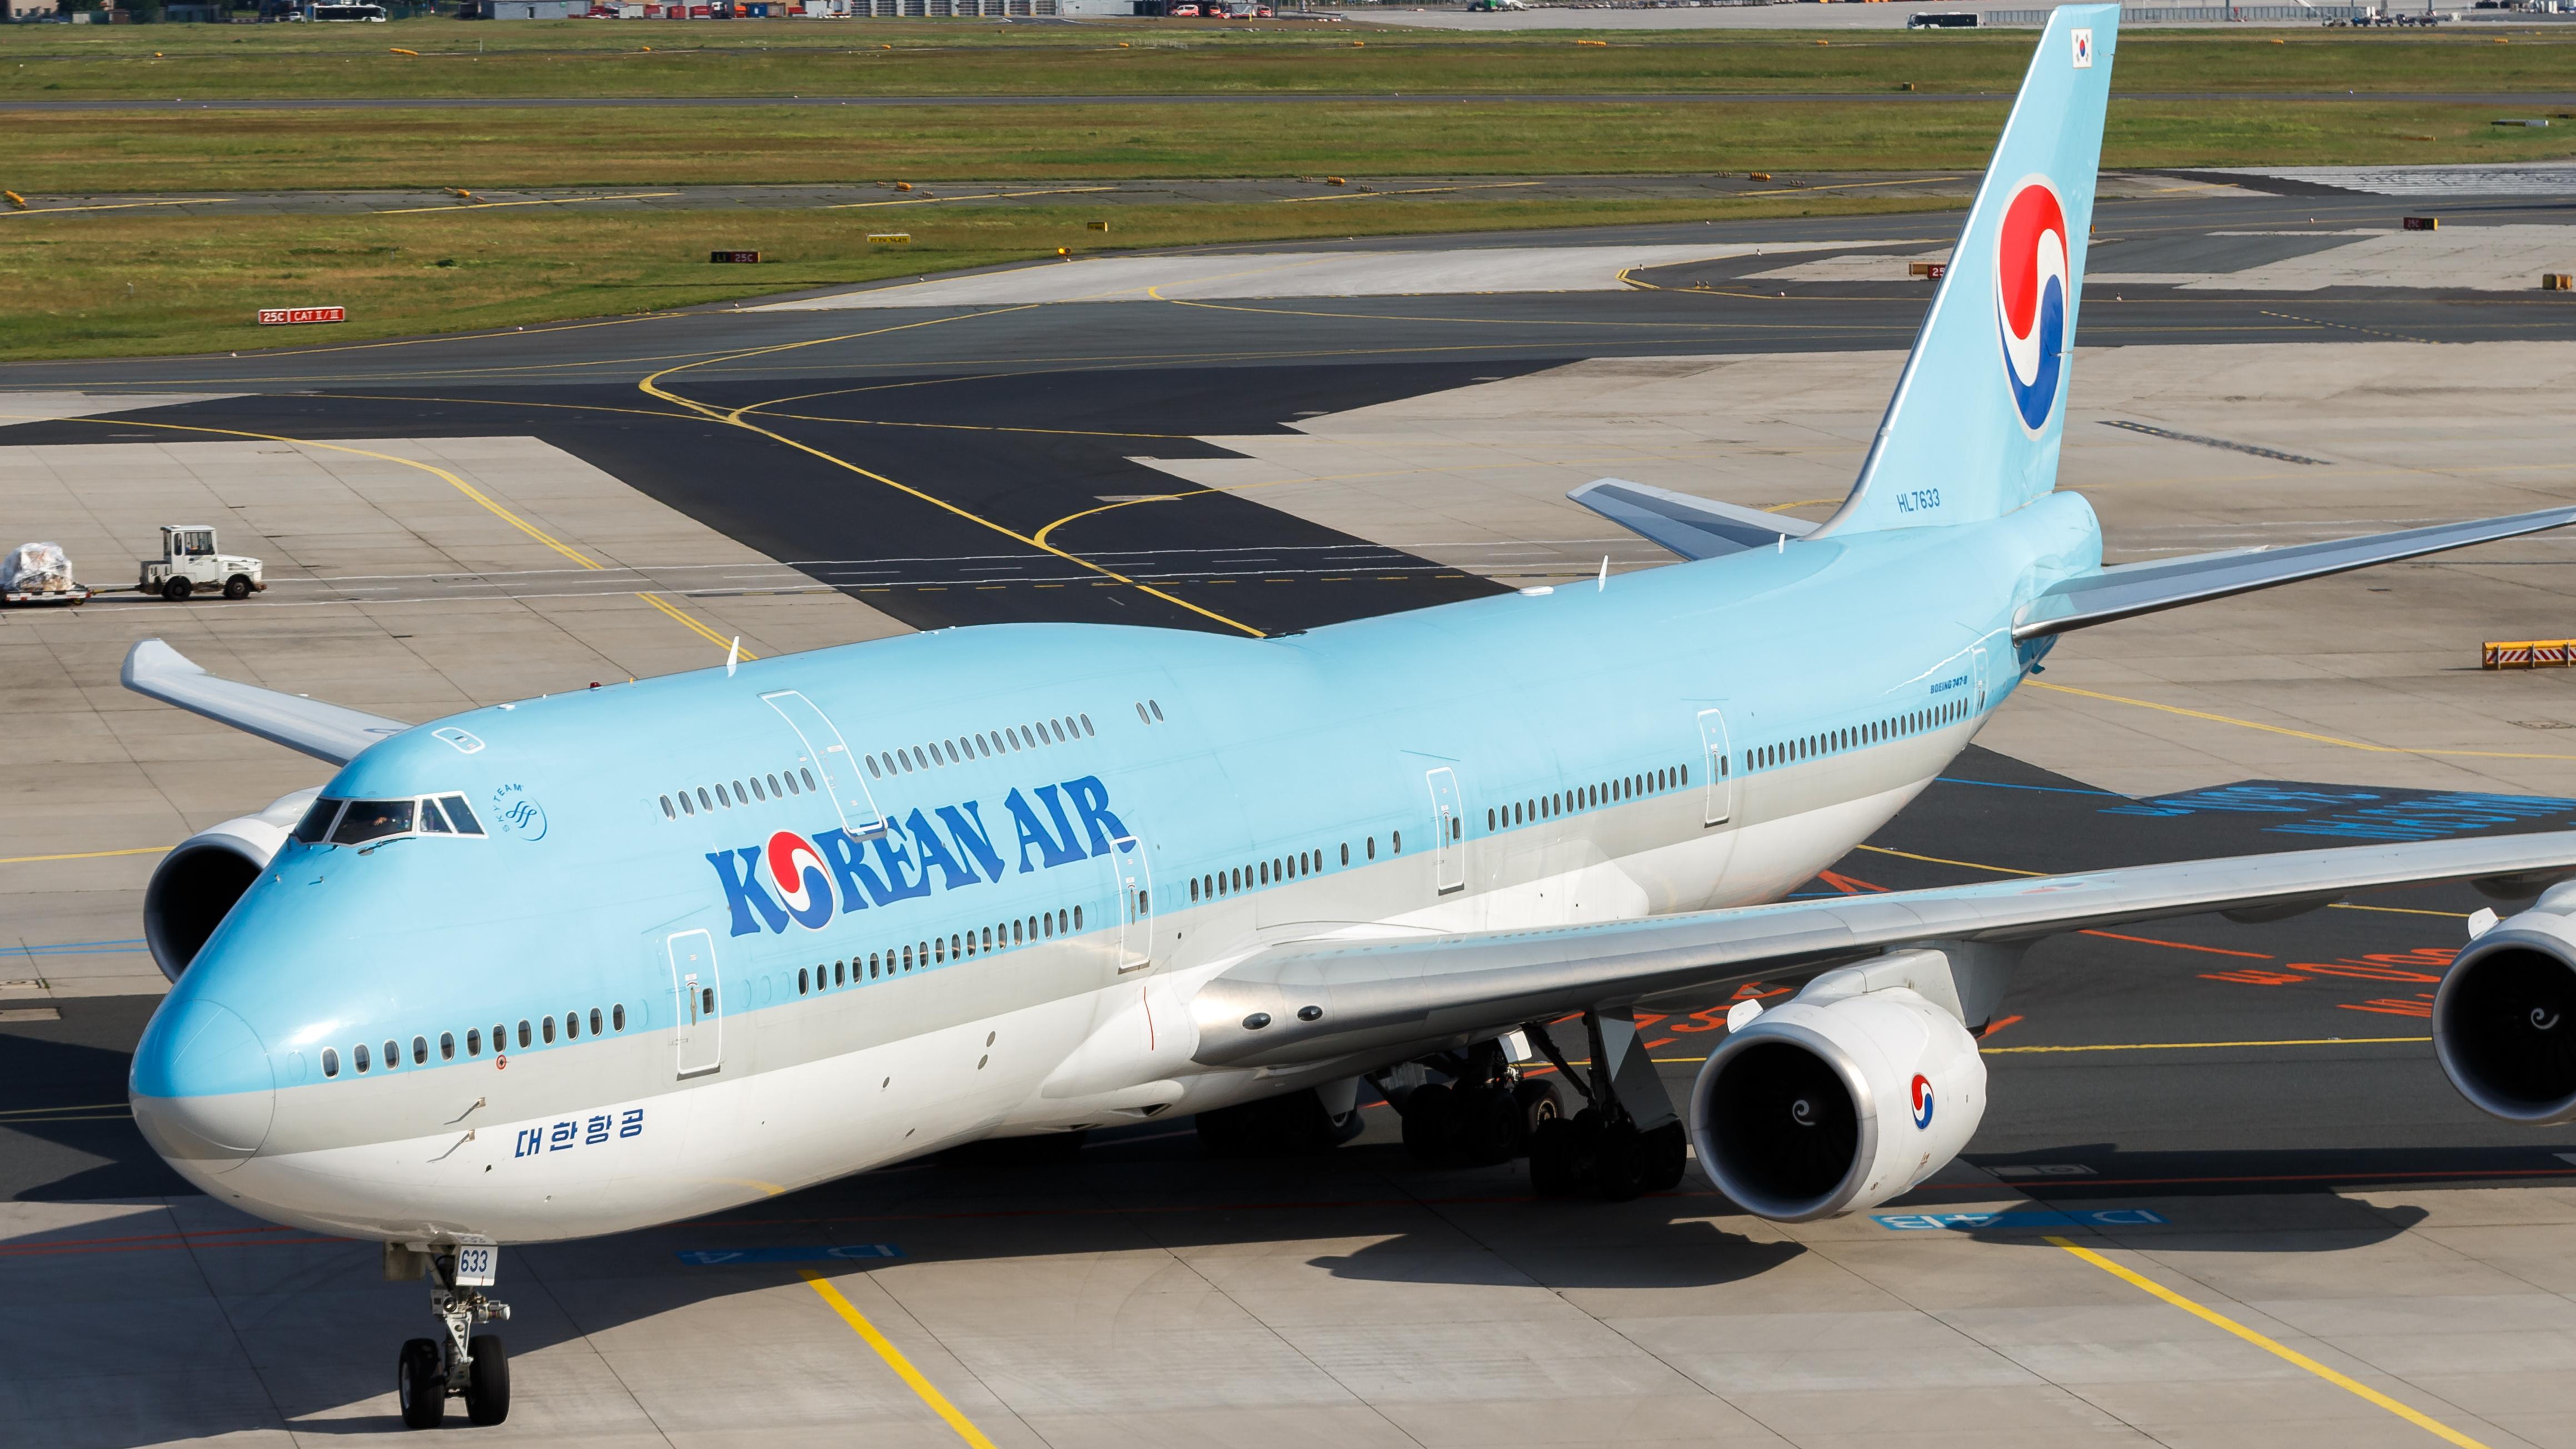 File:Korean Air Lines Boeing 747-8 (HL7633) at Frankfurt